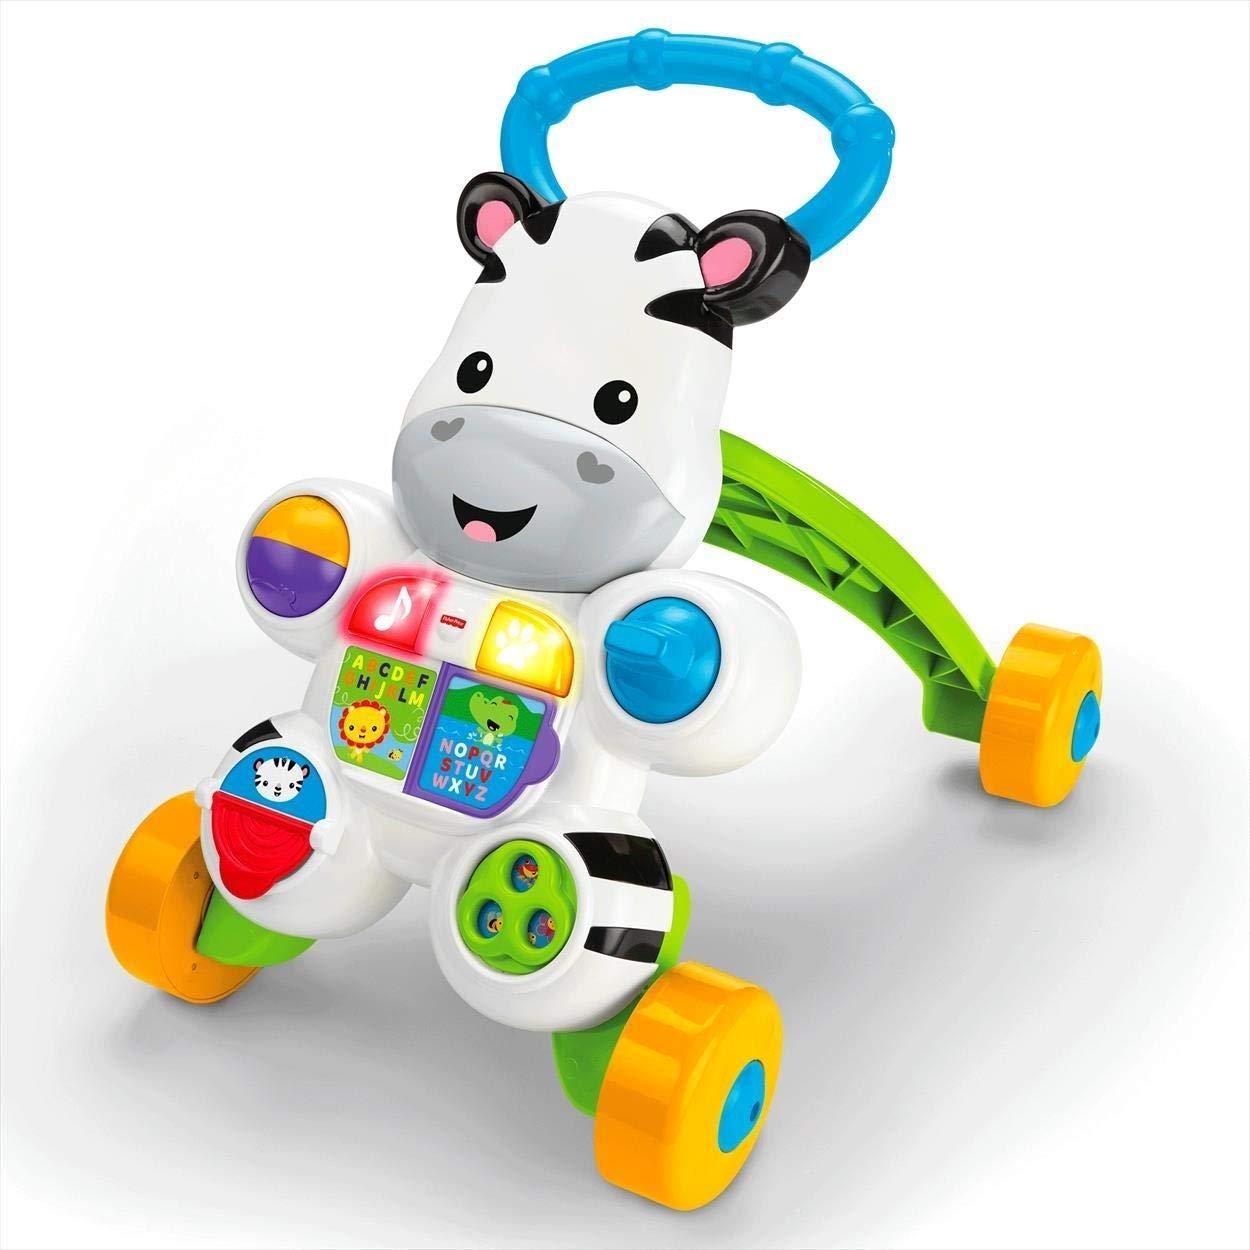 Fisher Price Cebra Parlanchina Primeros pasos, correpasillos bebés 6 meses (Mattel DLD80)